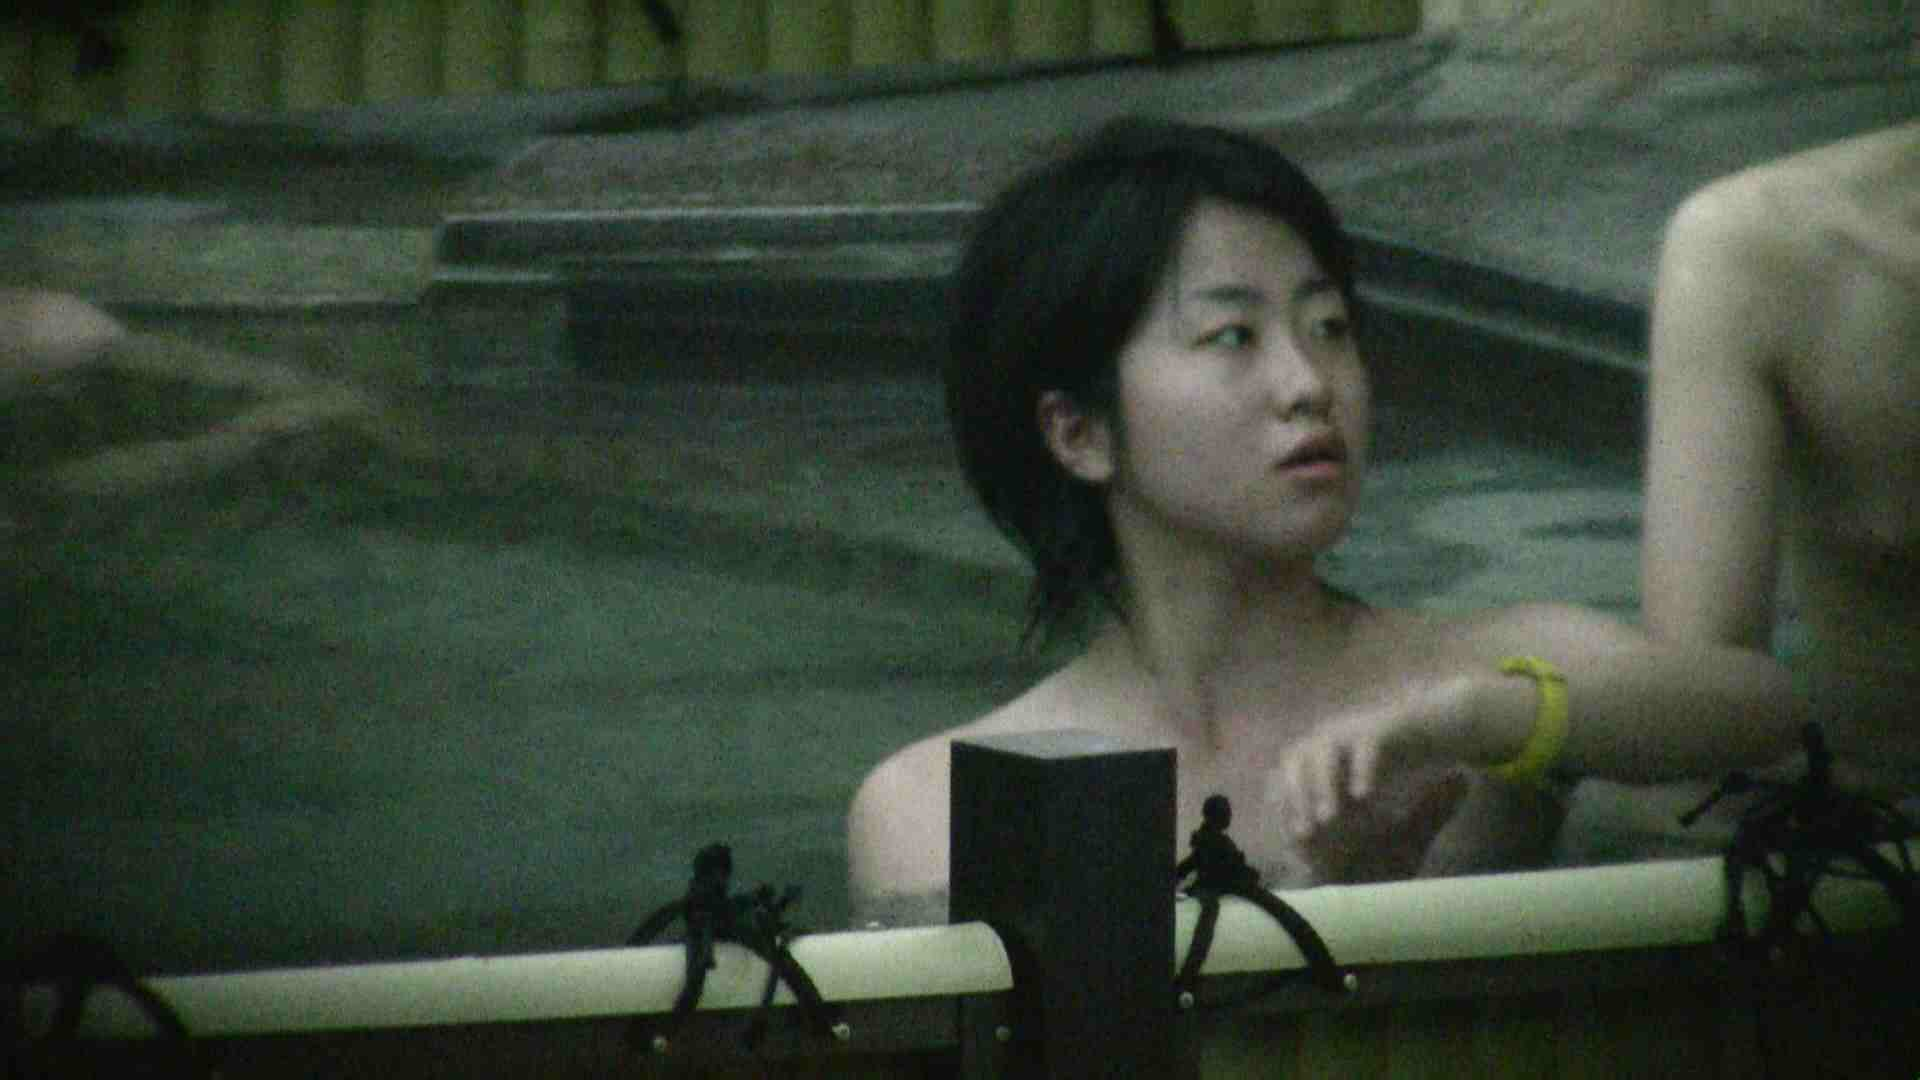 Aquaな露天風呂Vol.112 0 | 0  68連発 51